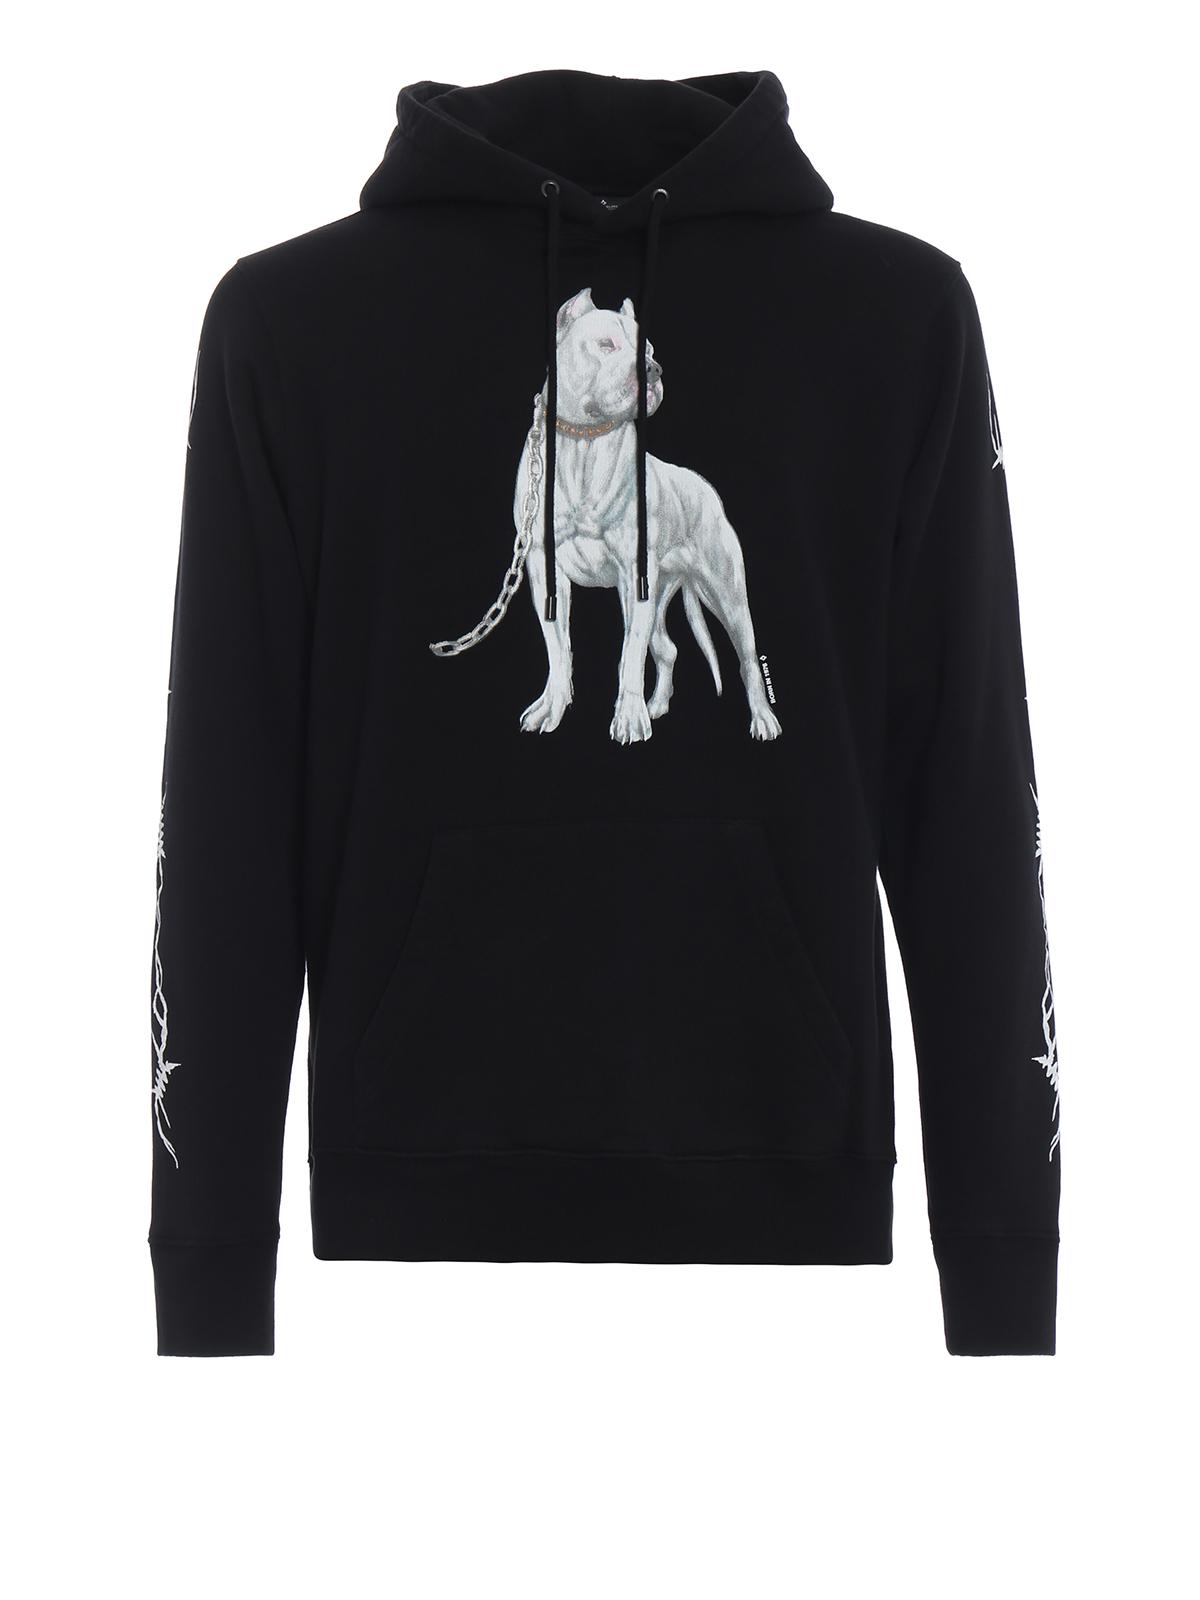 7157e80f30ef Marcelo Burlon - Dogo black cotton hoodie - Sweatshirts   Sweaters ...